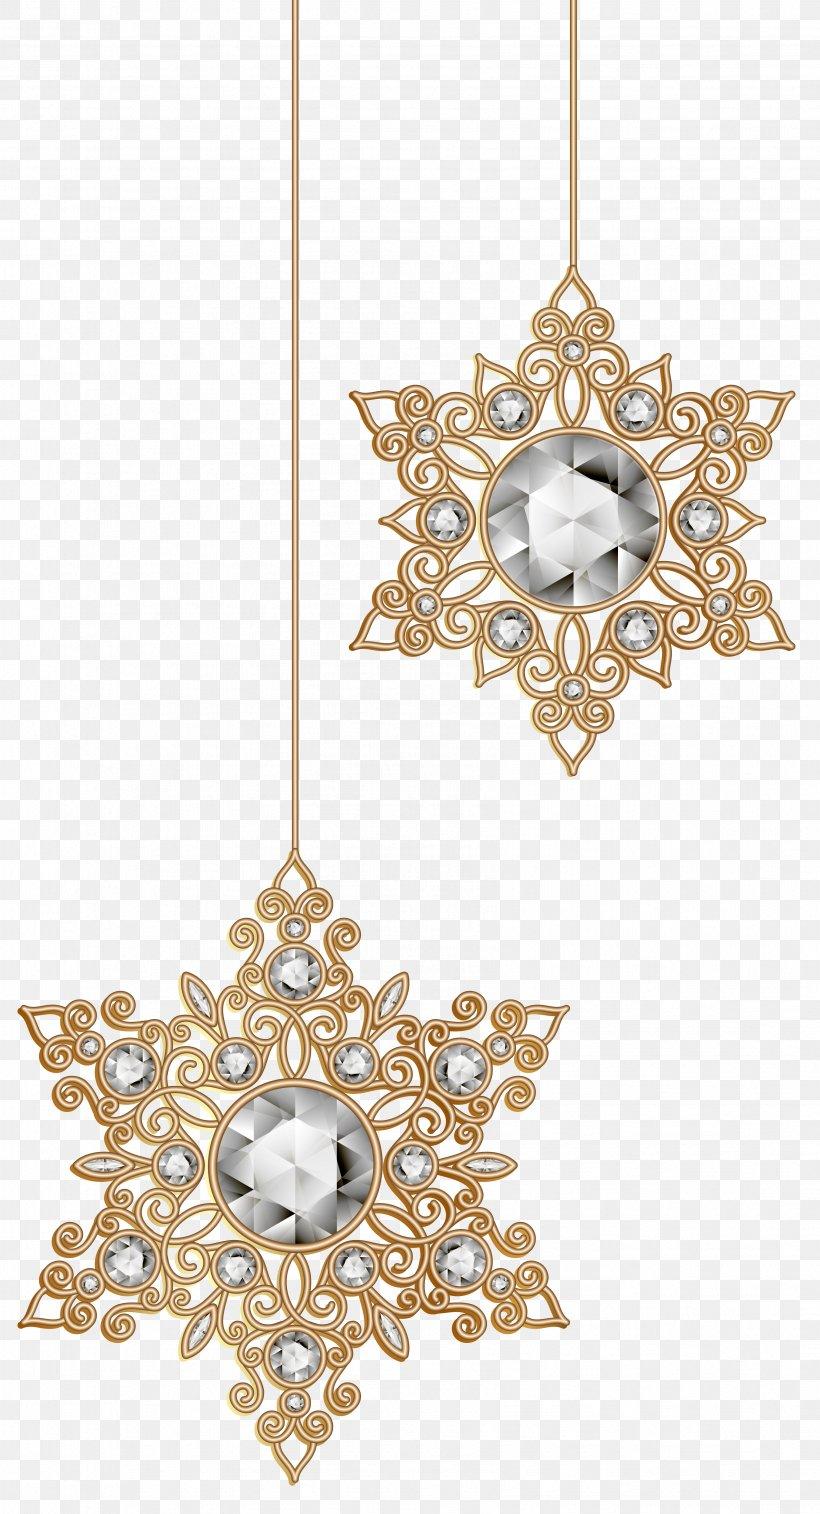 Christmas Ornament Clip Art Christmas Image, PNG, 3369x6222px, Christmas Ornament, Body Jewelry, Christmas Day, Clip Art Christmas, Earrings Download Free